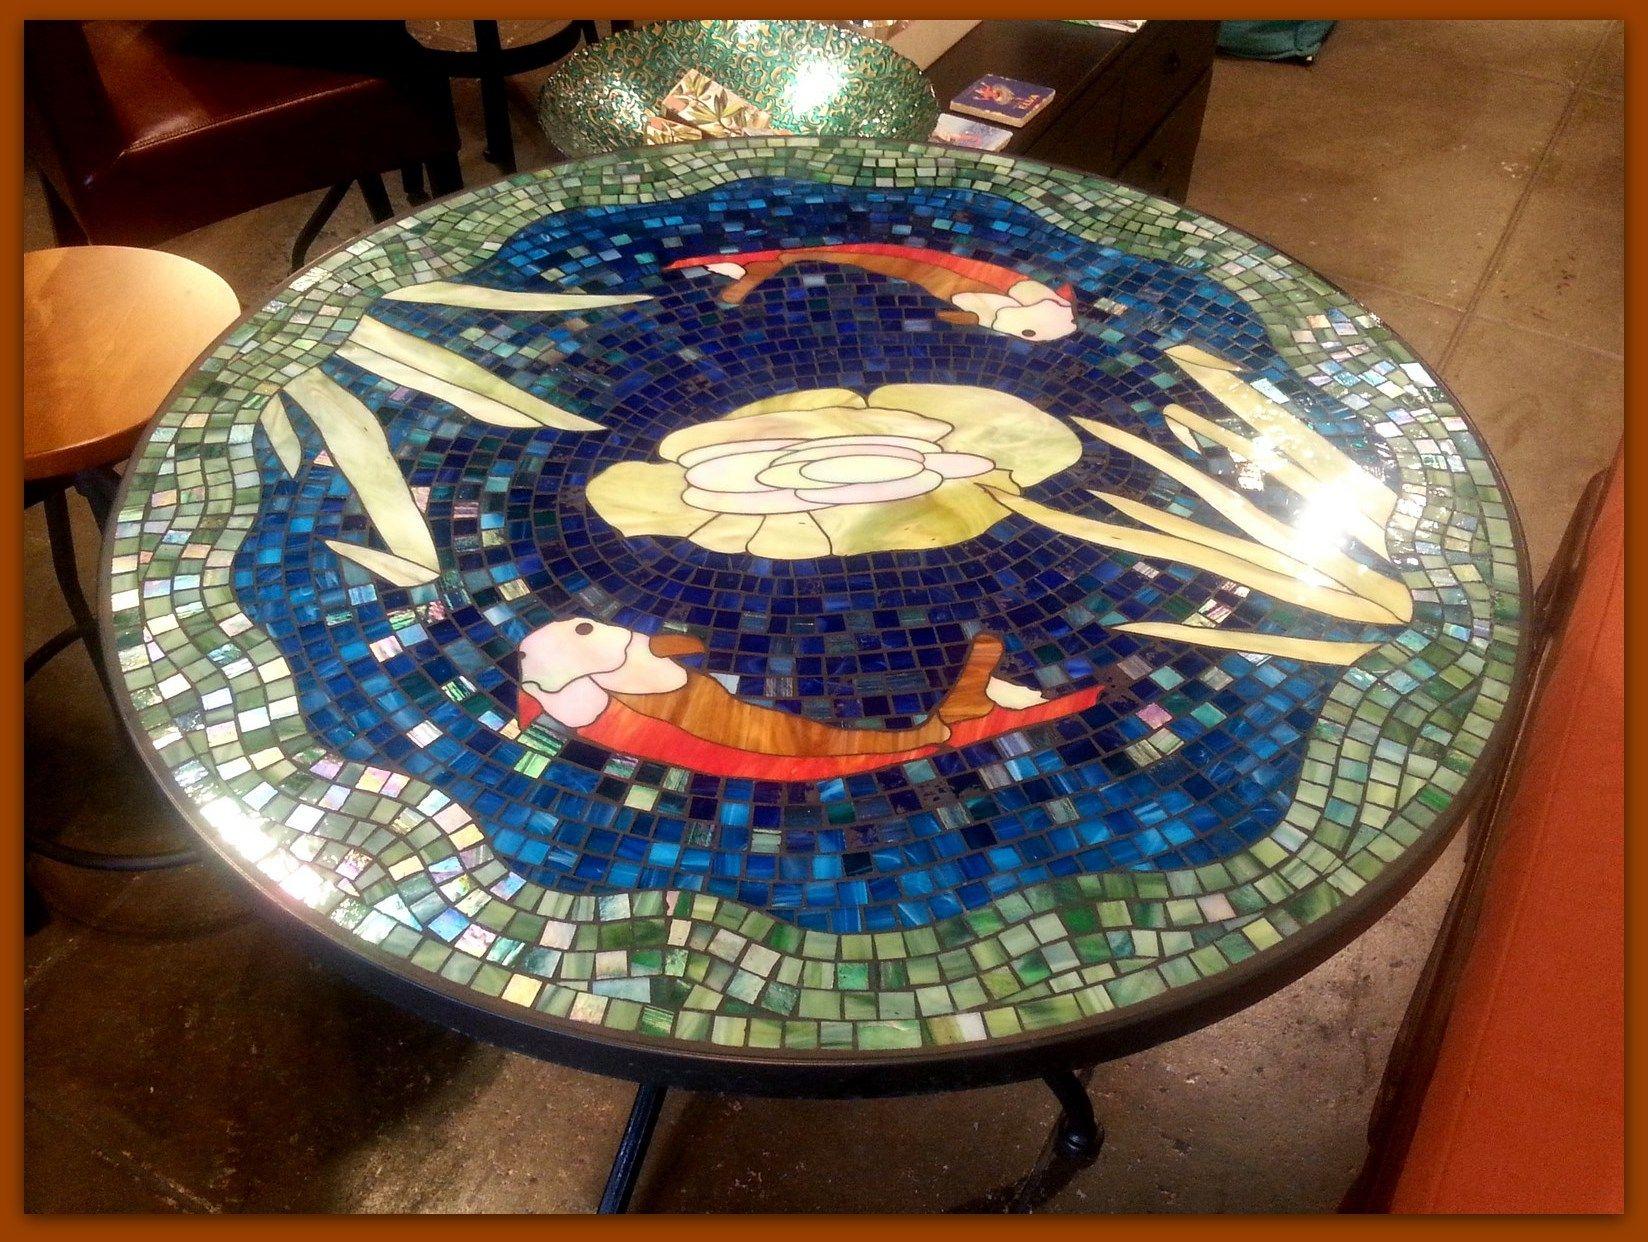 glass_mosaic_patio_table.jpg 1,648×1,242 pixels